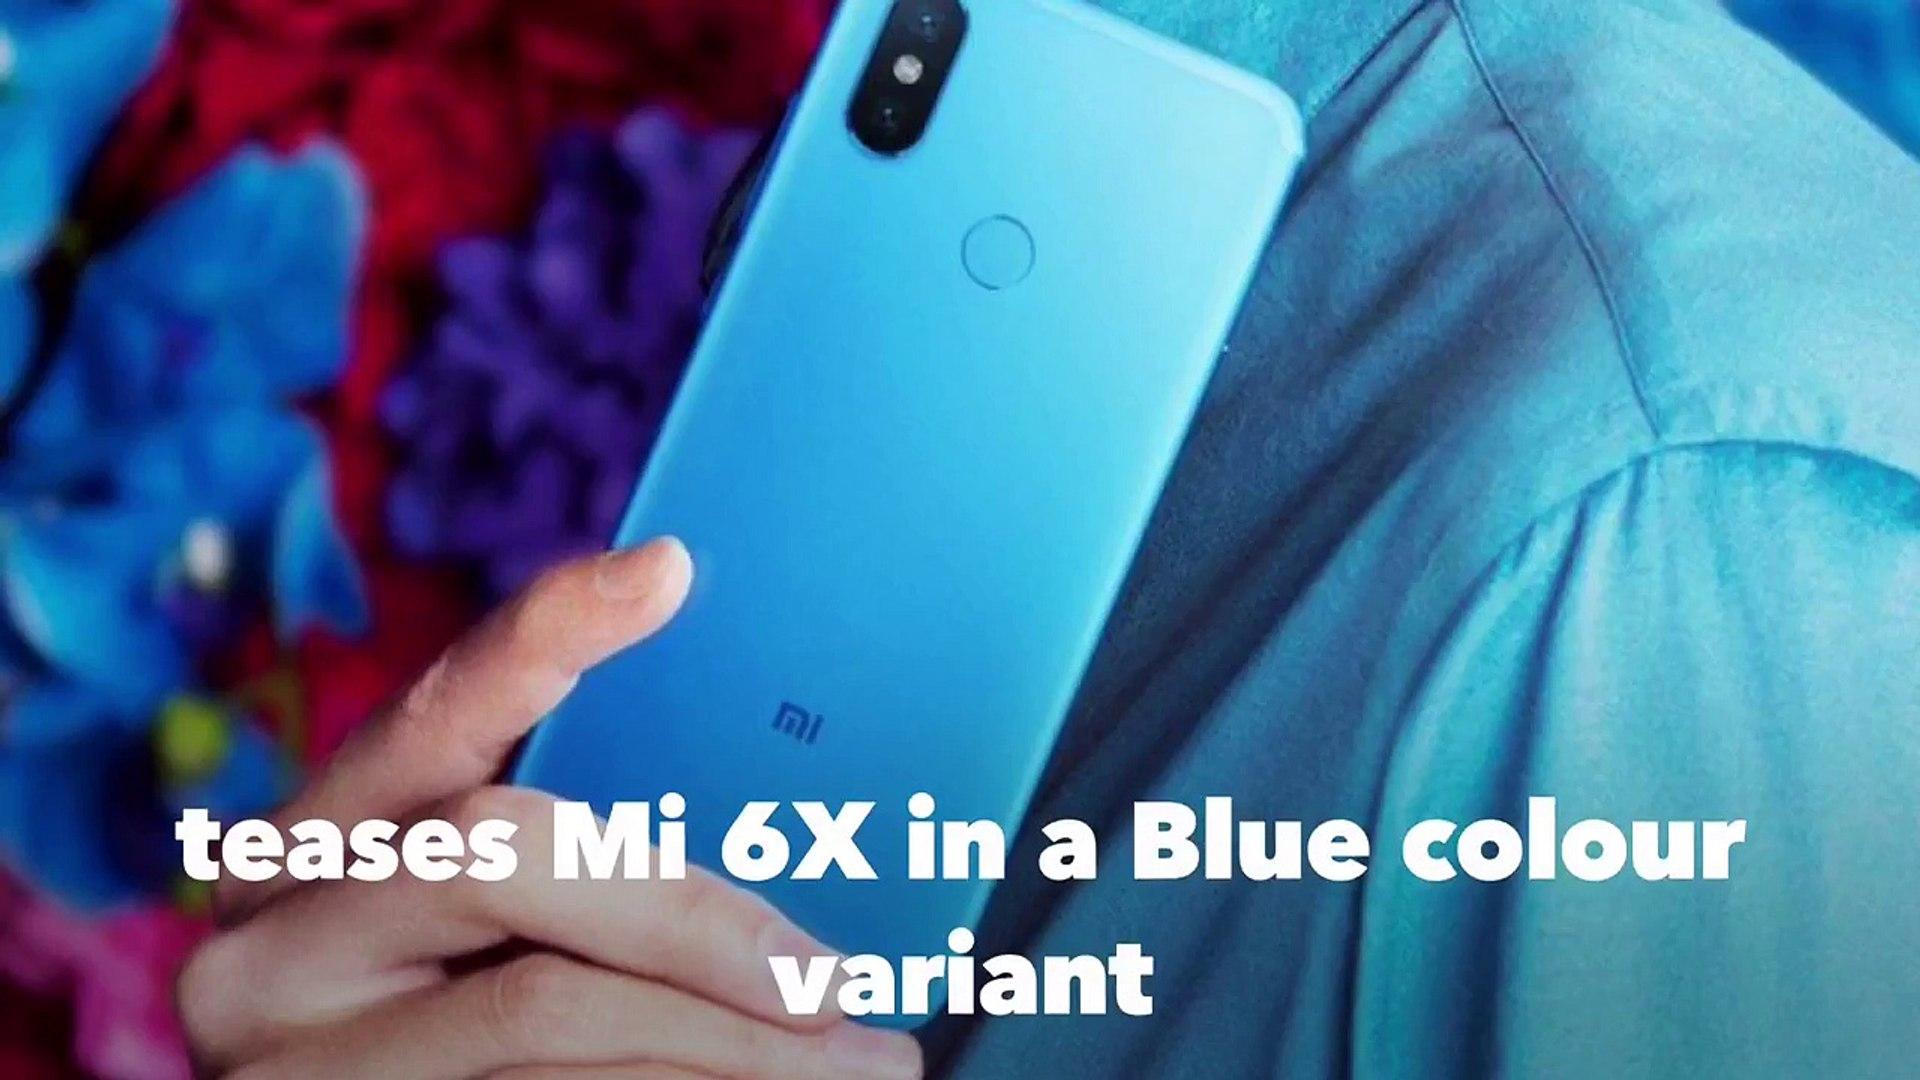 Xiaomi upcoming powerful phone Mi6x. Main features